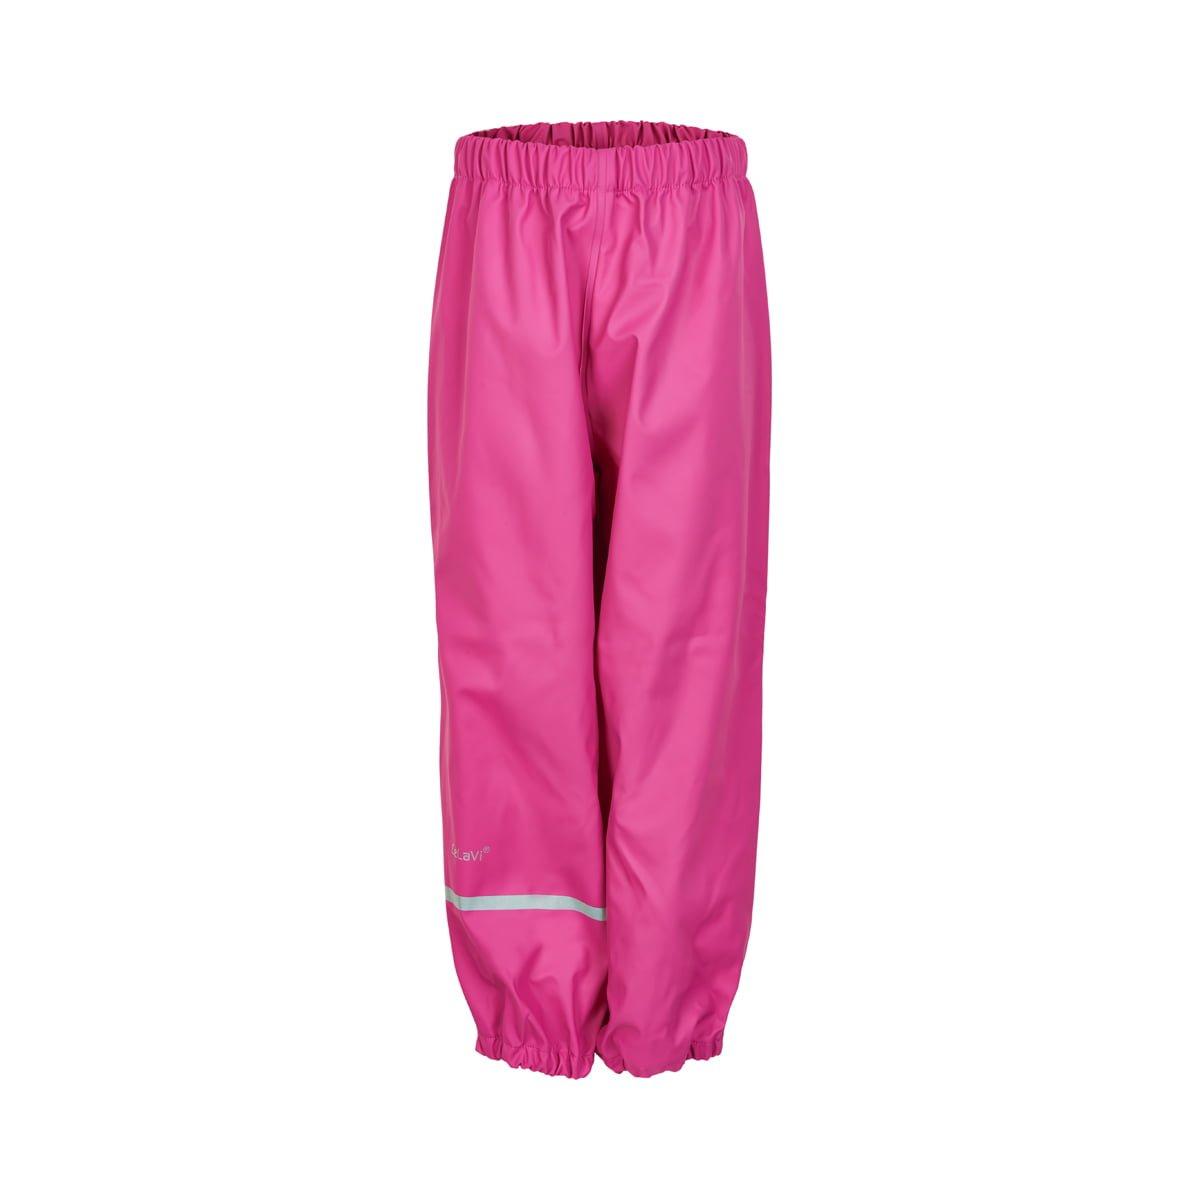 Pantaloni de ploaie și vânt (impermeabil) real pink CeLaVi 1